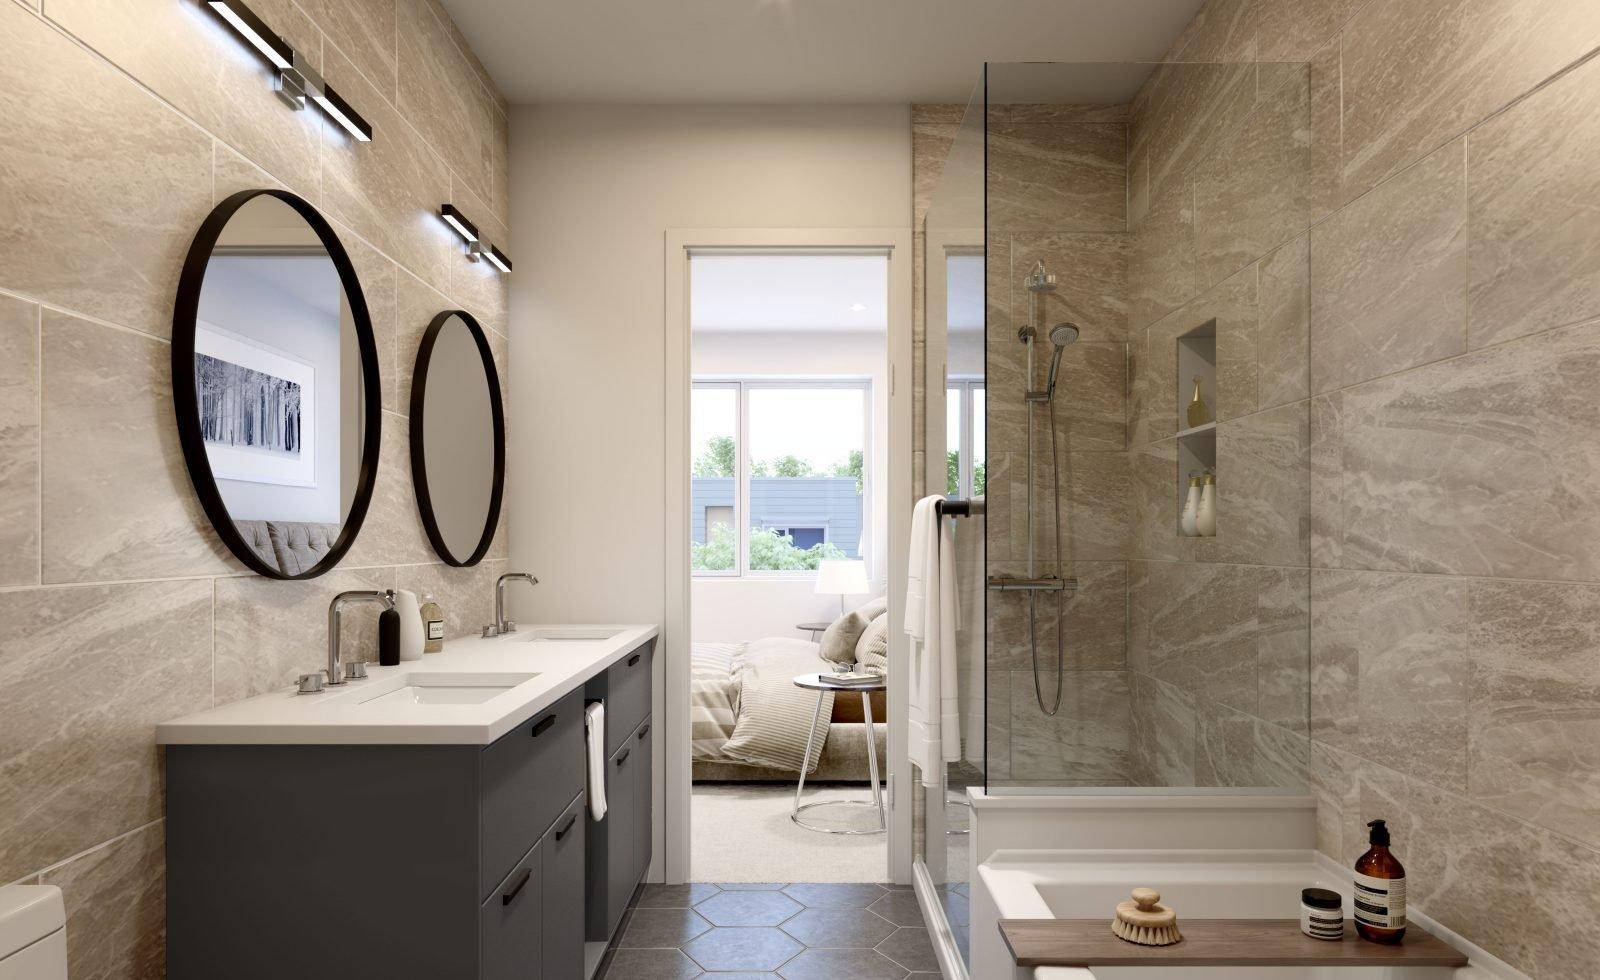 Bathroom - 606 Foster Ave, Coquitlam, BC V3J 2L7, Canada!